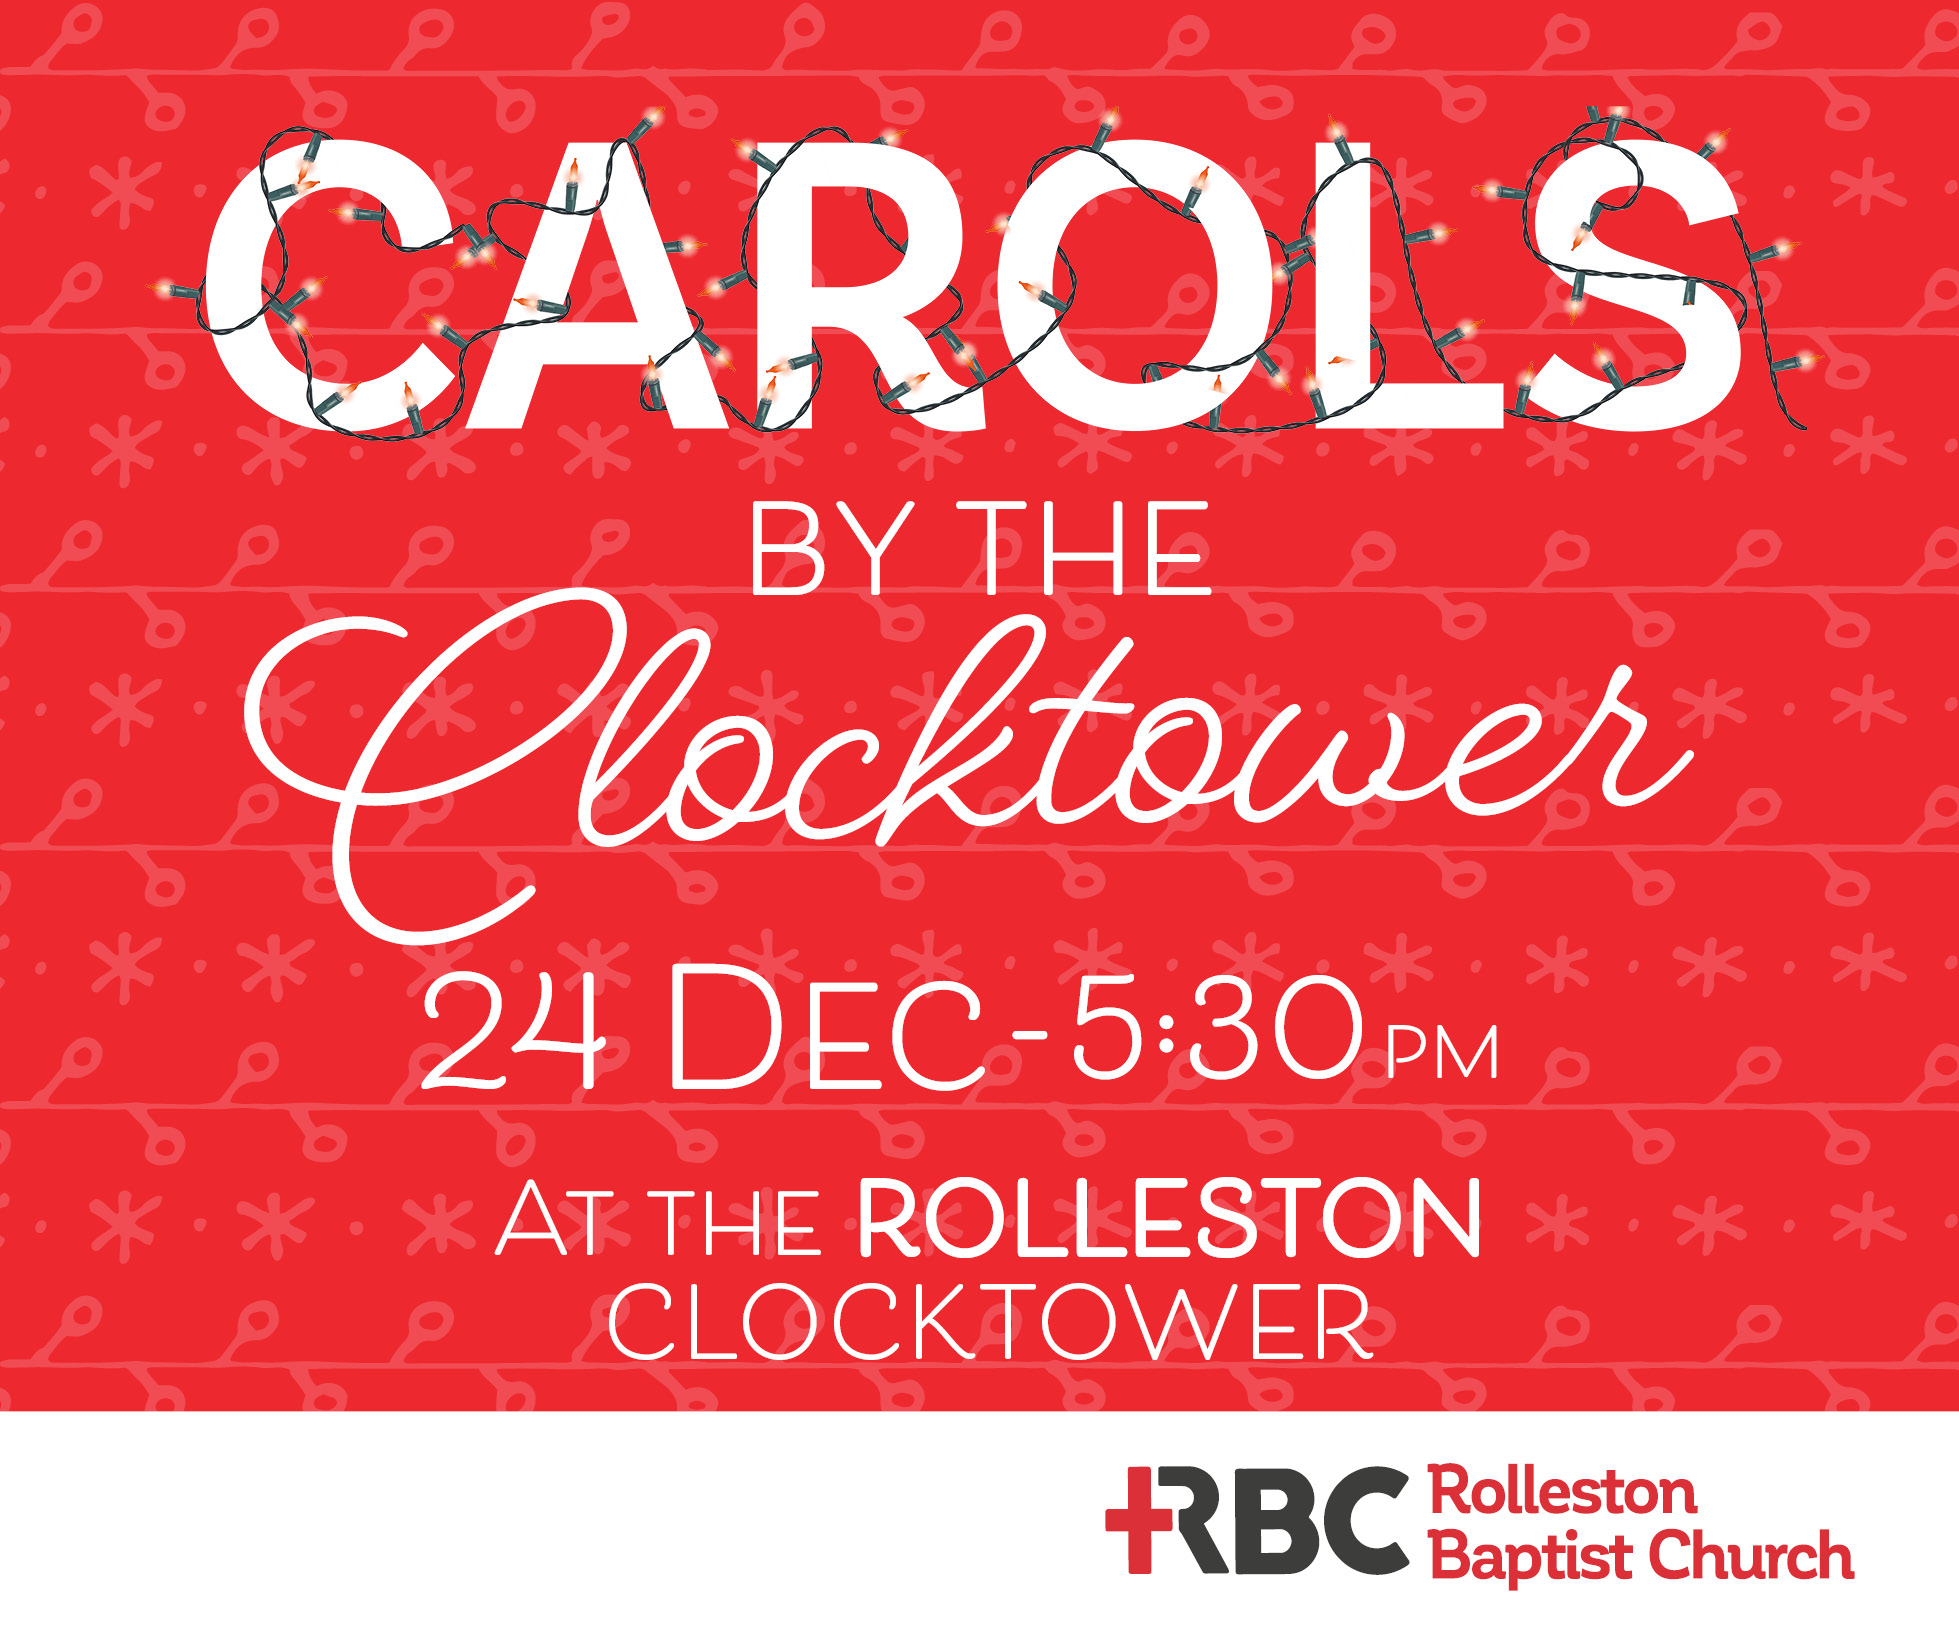 carols-by-the-clocktower-fb